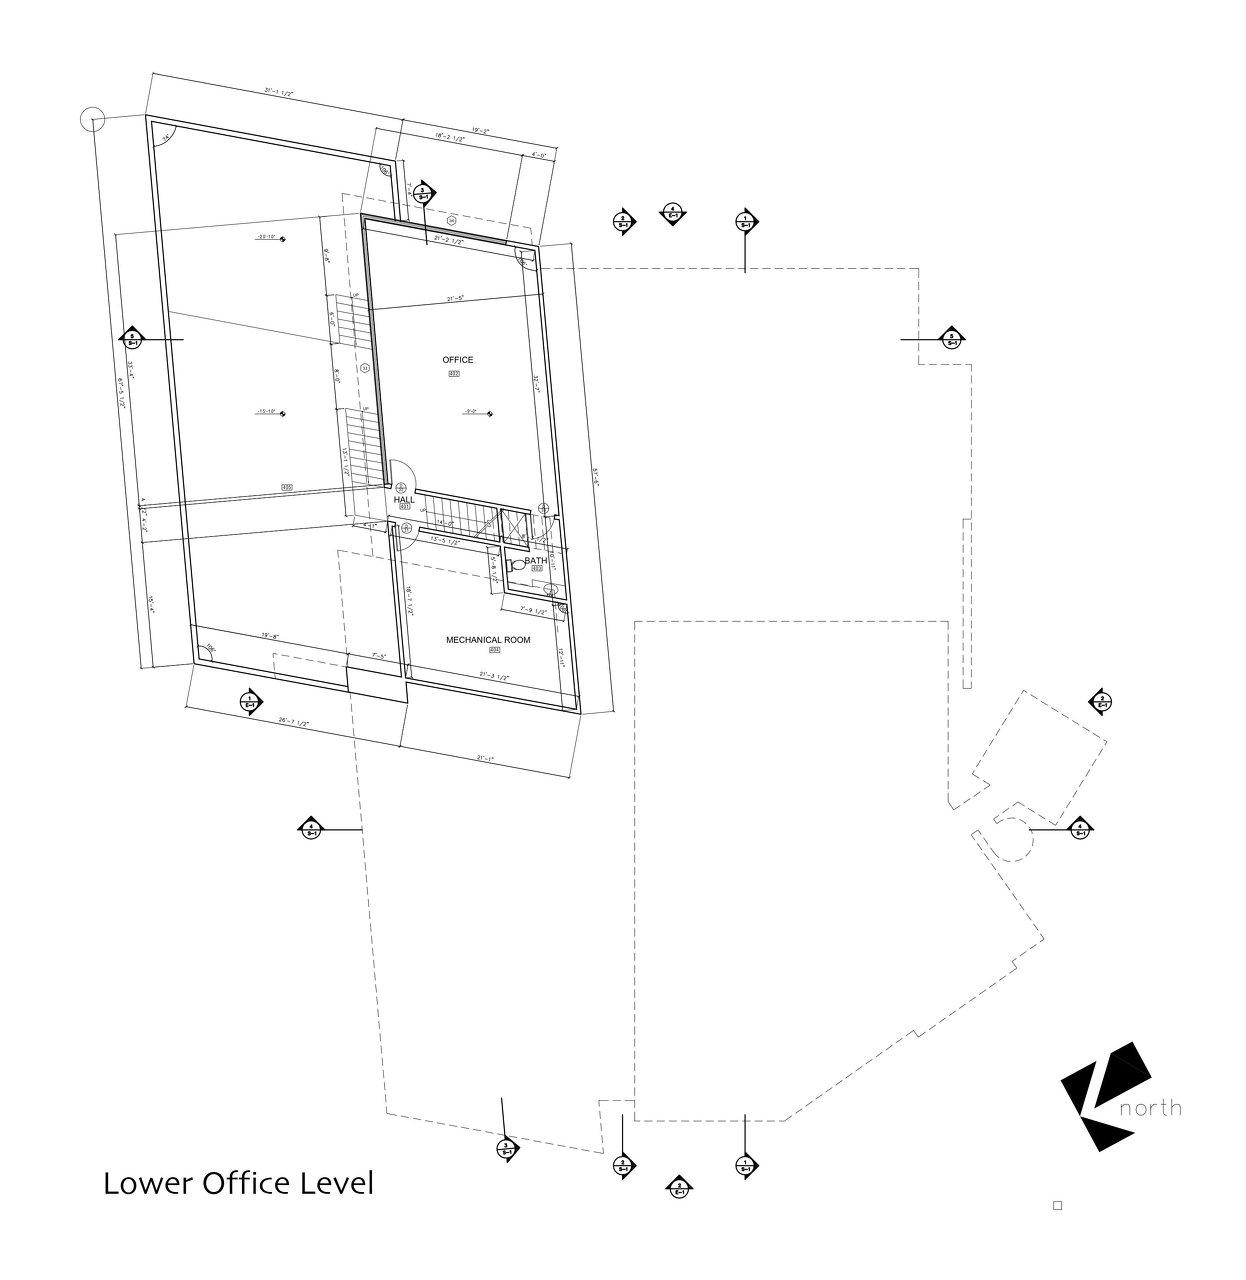 Lower Office Level Plan